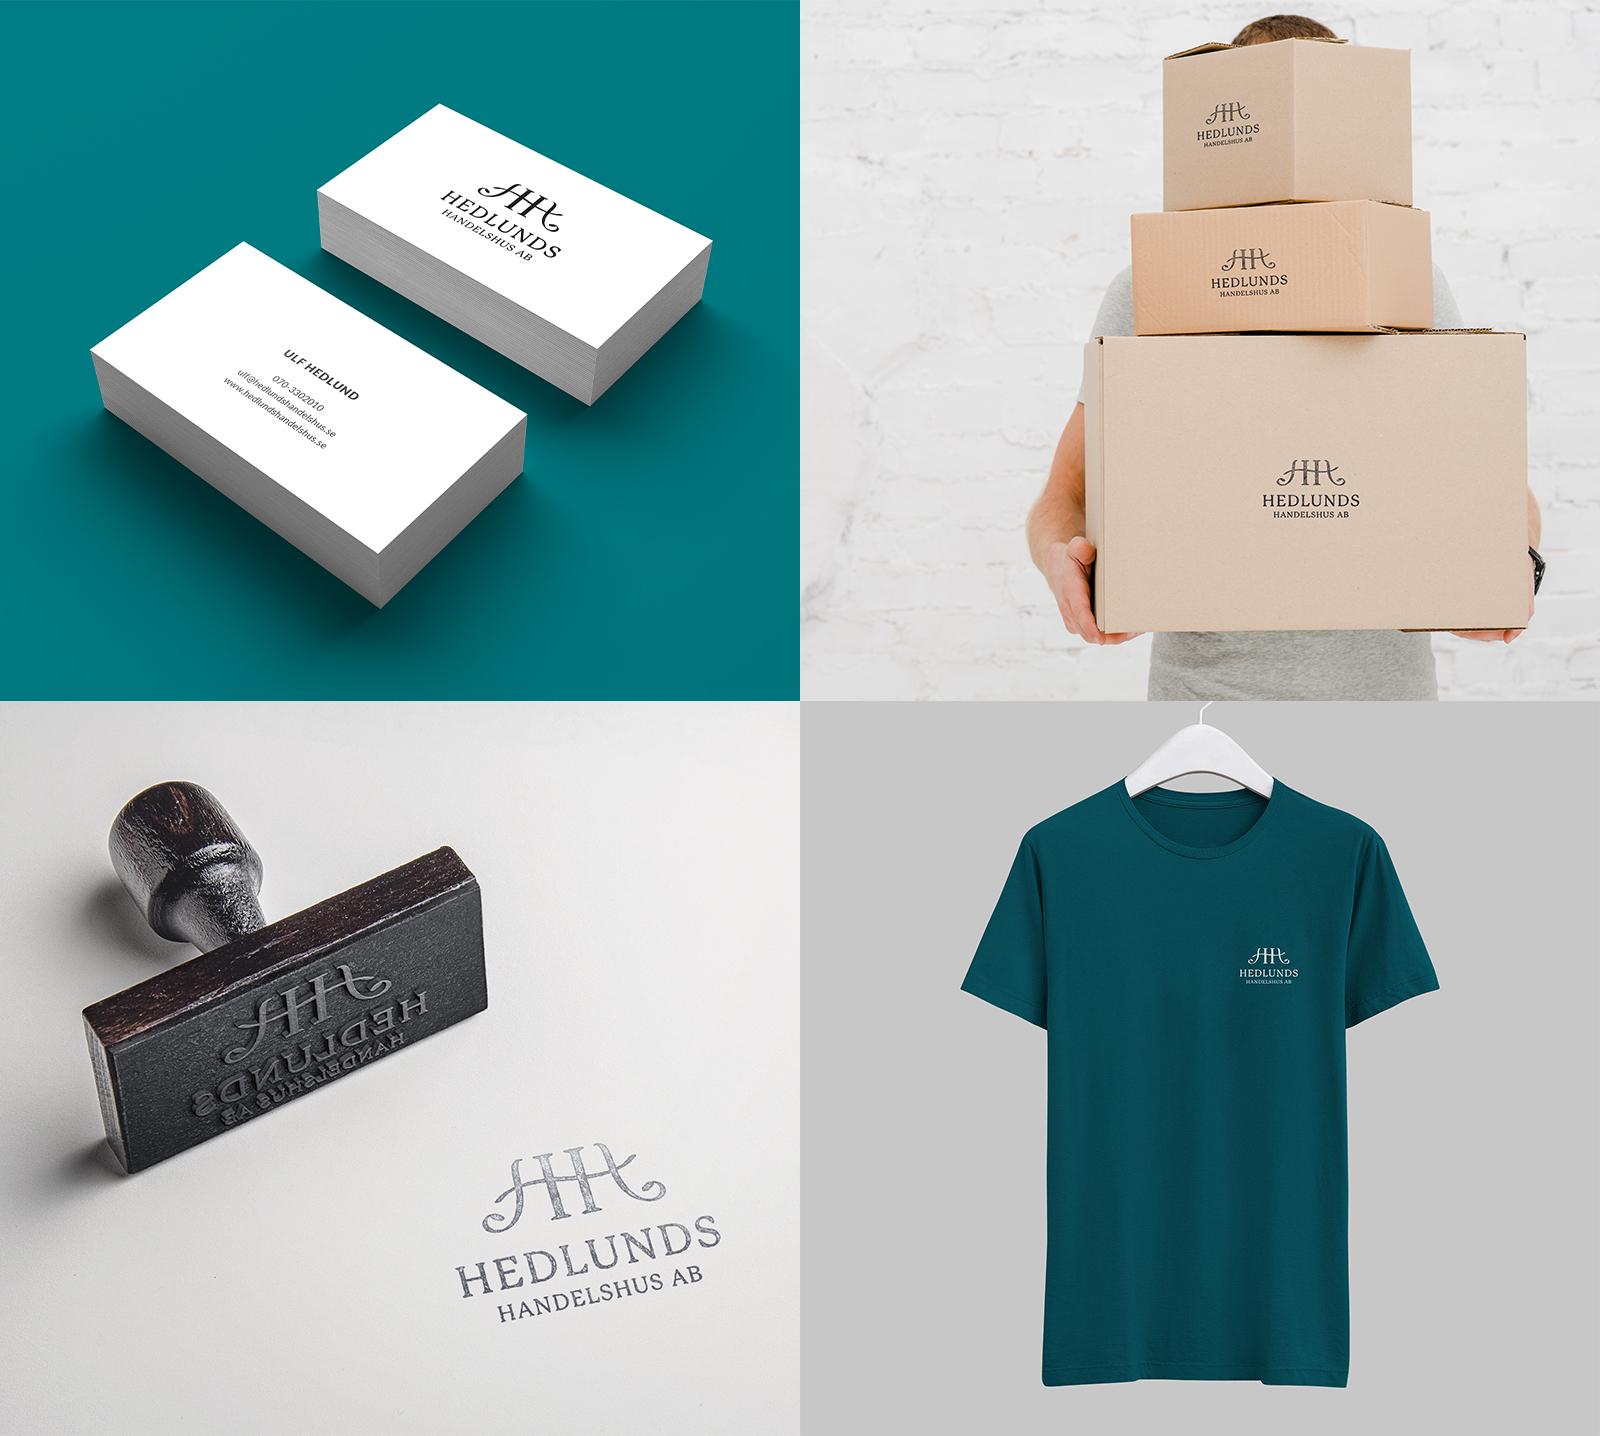 Hedlunds_Handelshus-logo-Mia_Olofsson_02